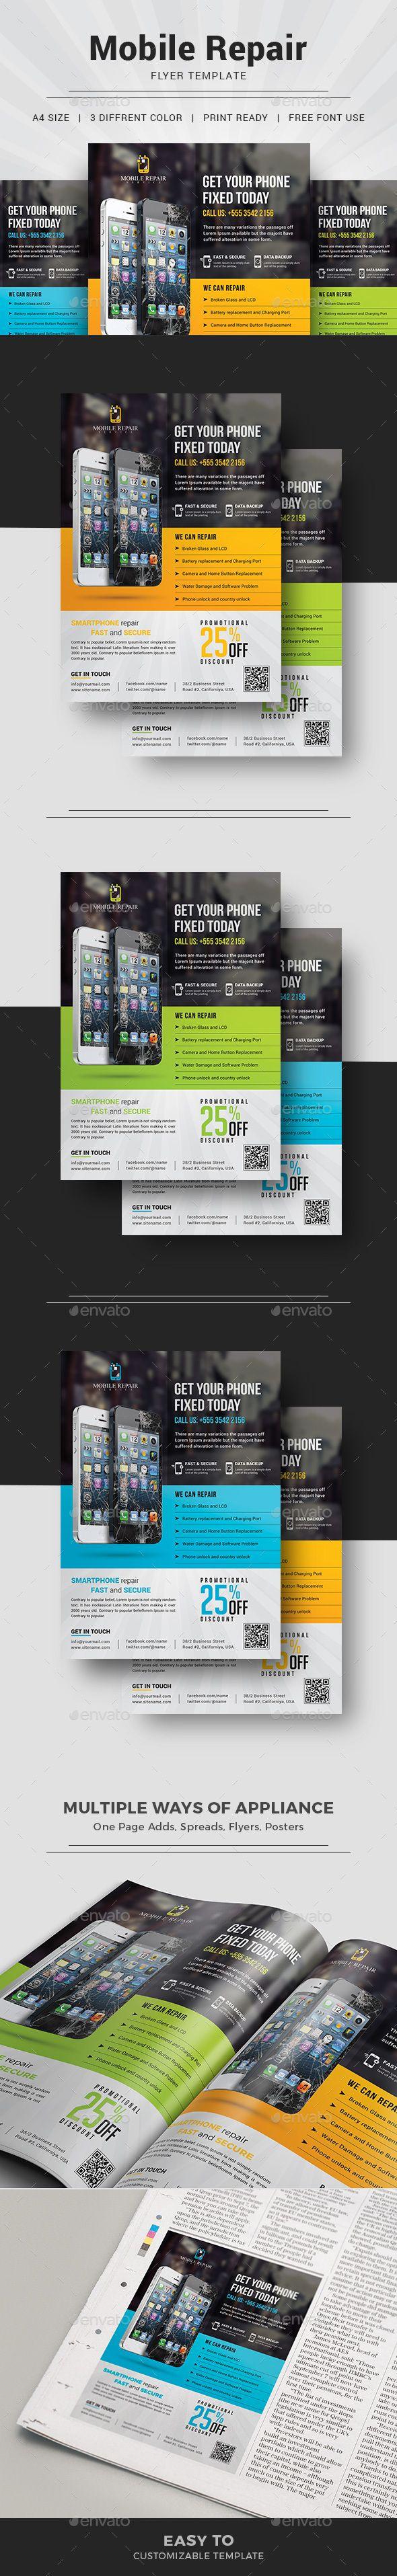 Smartphone Repair Service Flyer – Computer Repair Flyer Template